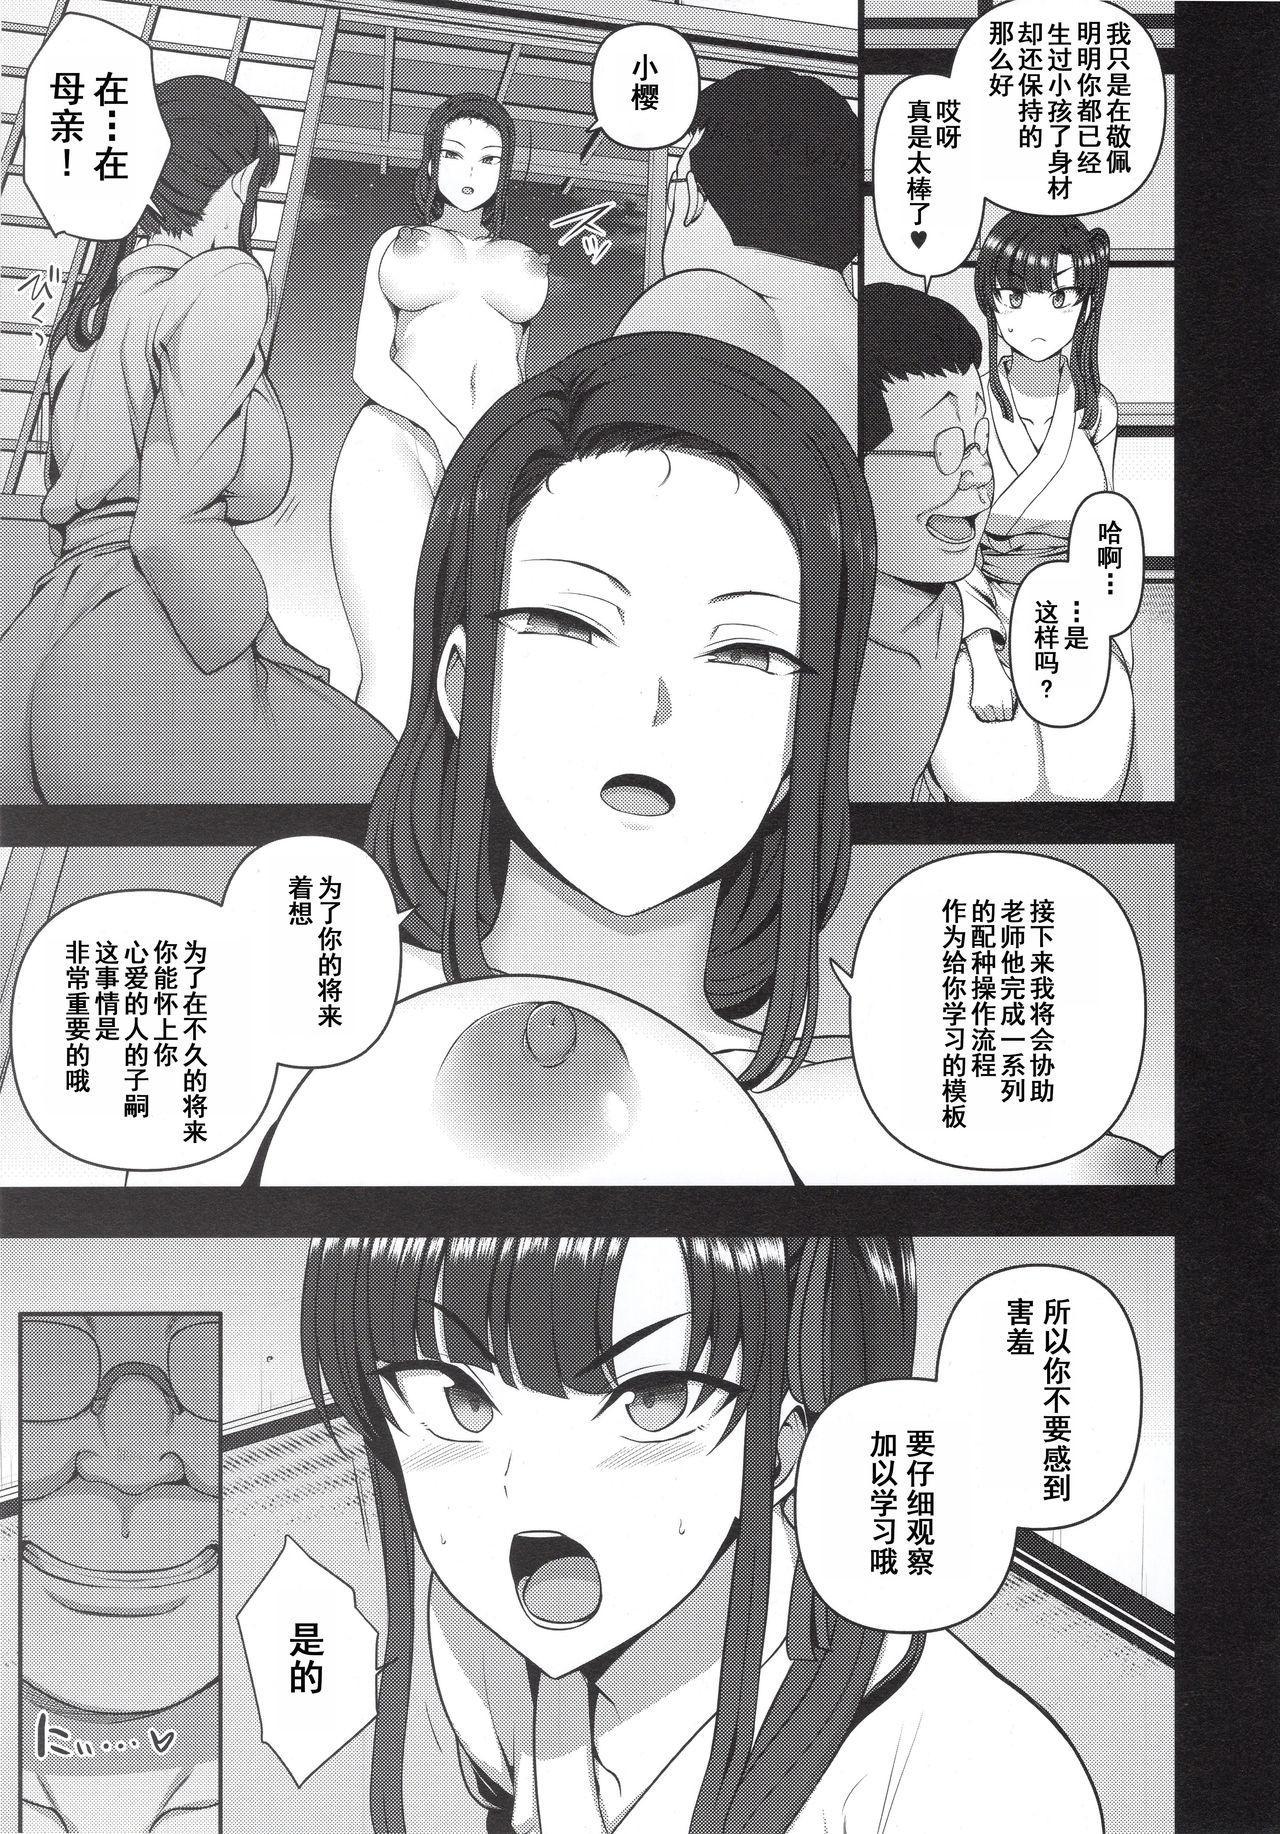 Saimin Seishidou 4: Ninshin Taiken Shidou 6